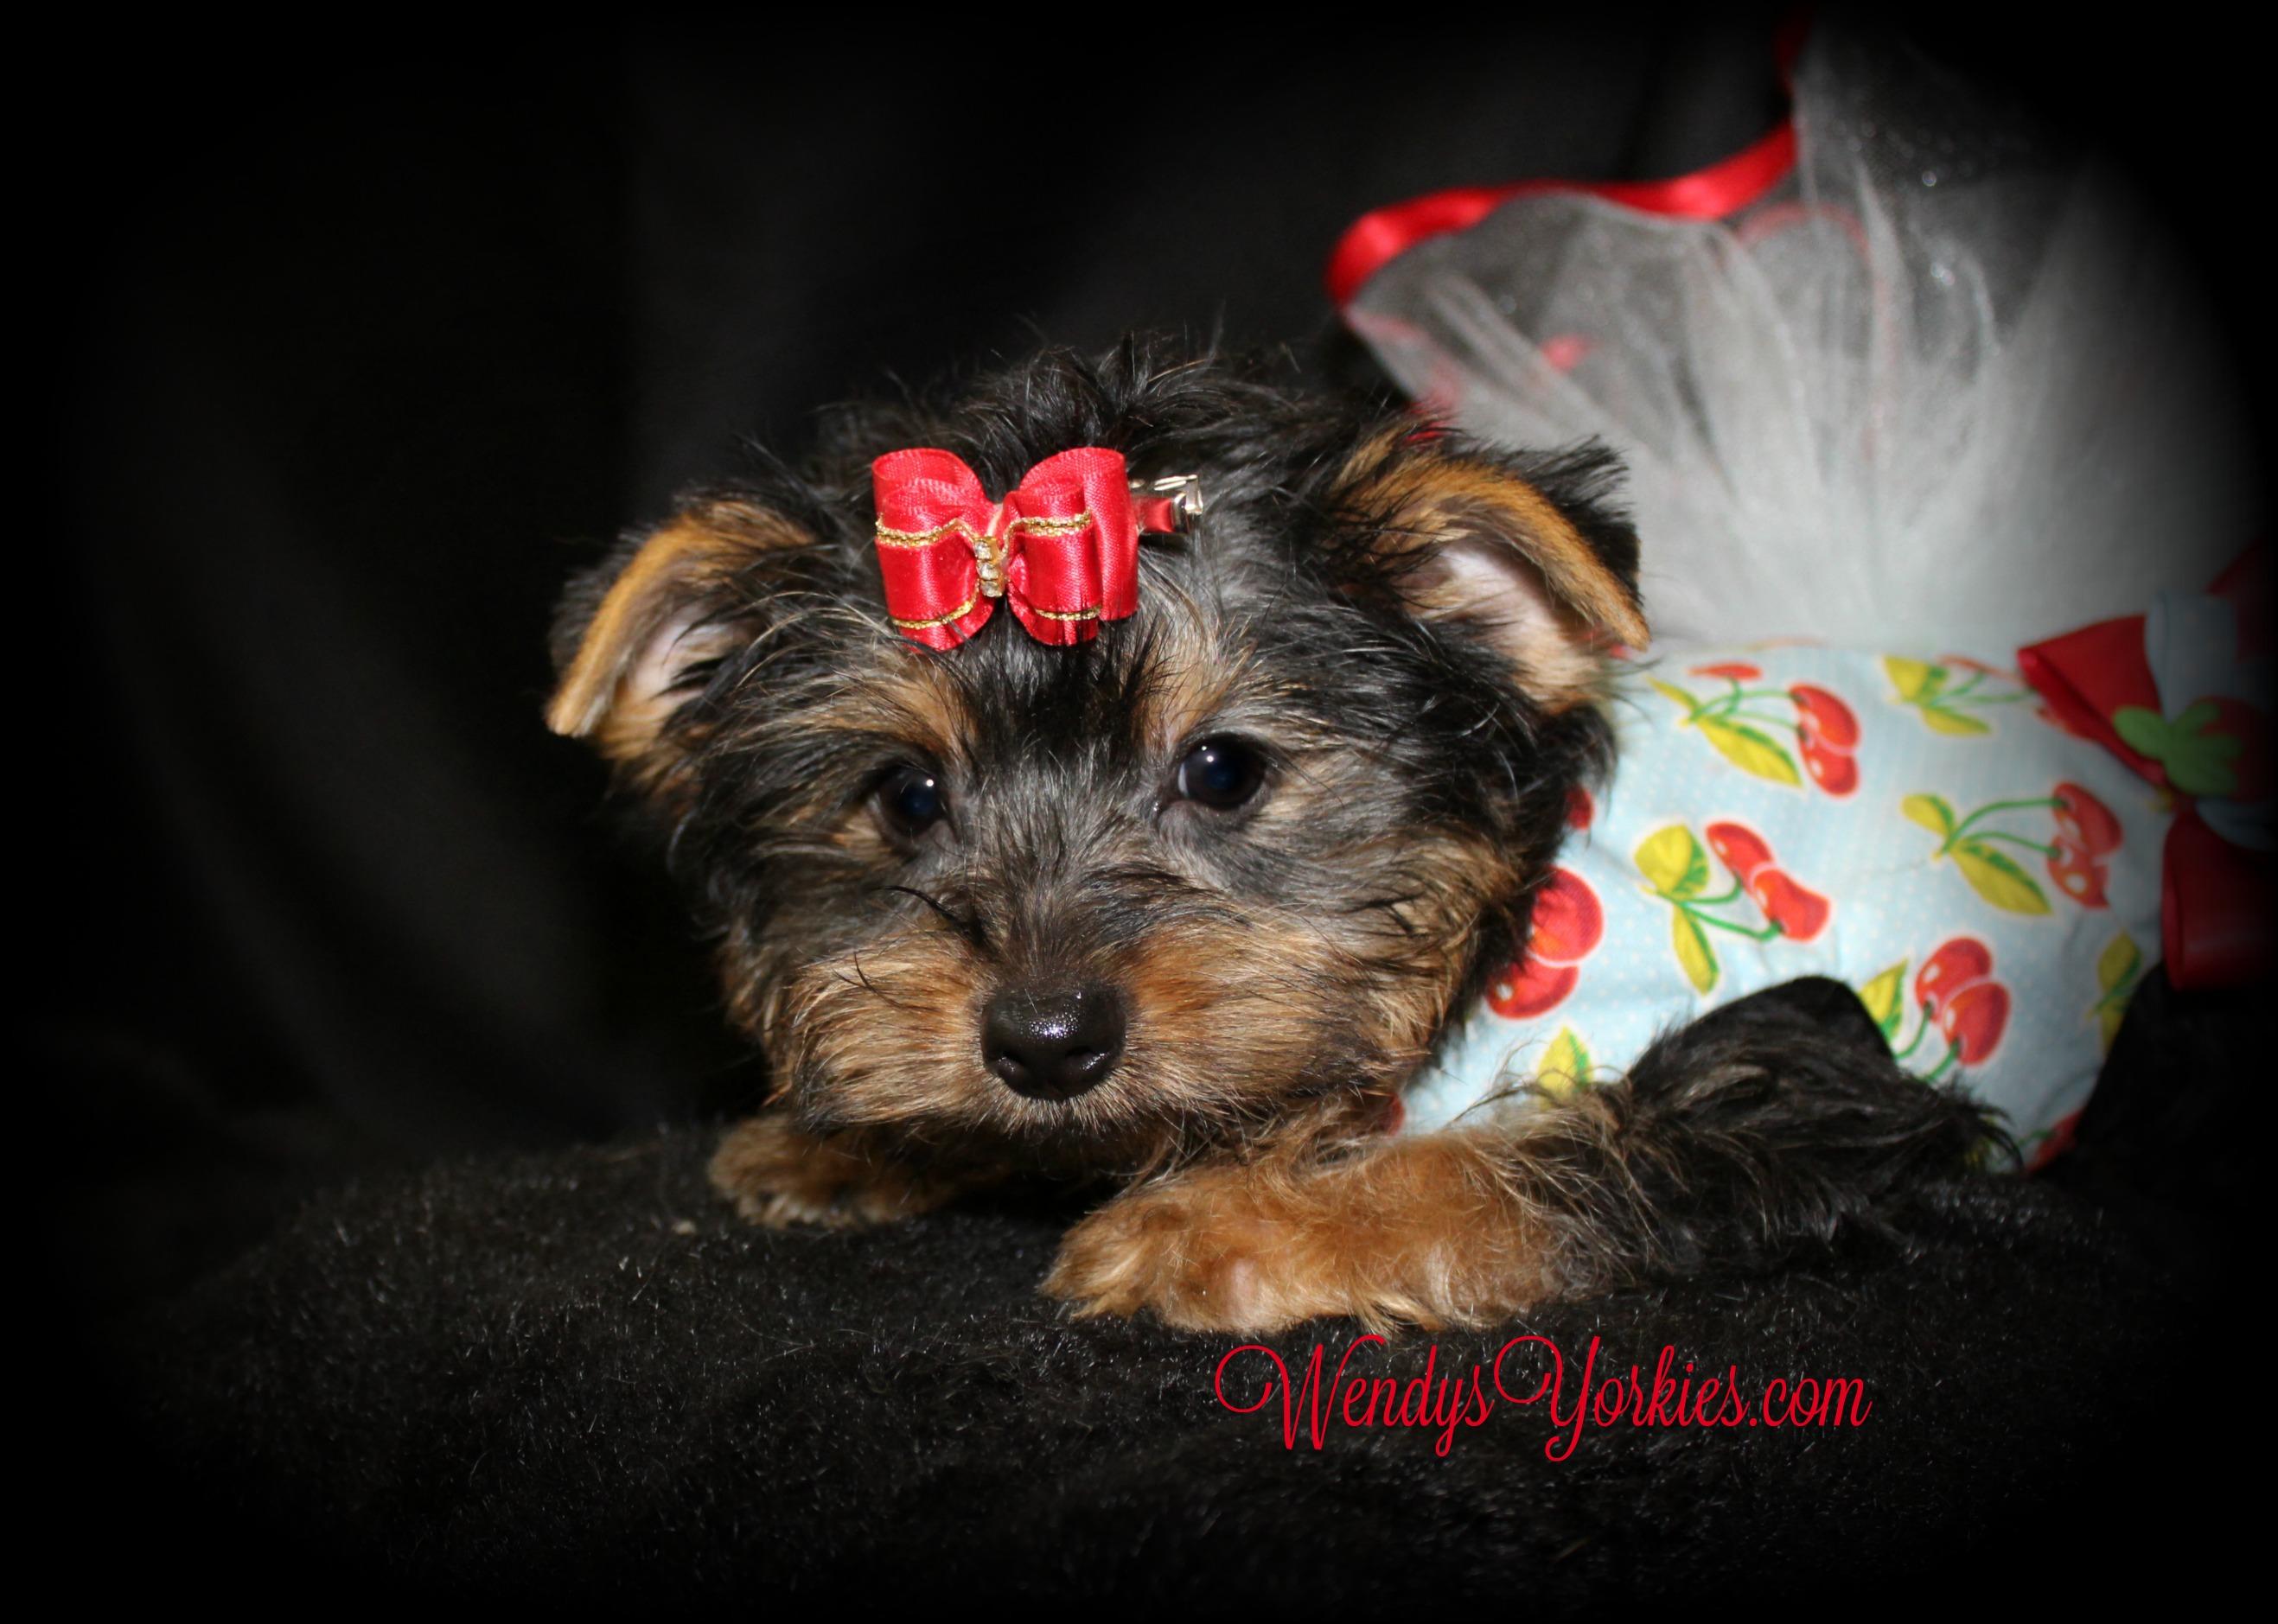 Female Yorkie puppy for sale, WendysYorkies.com, anna f1